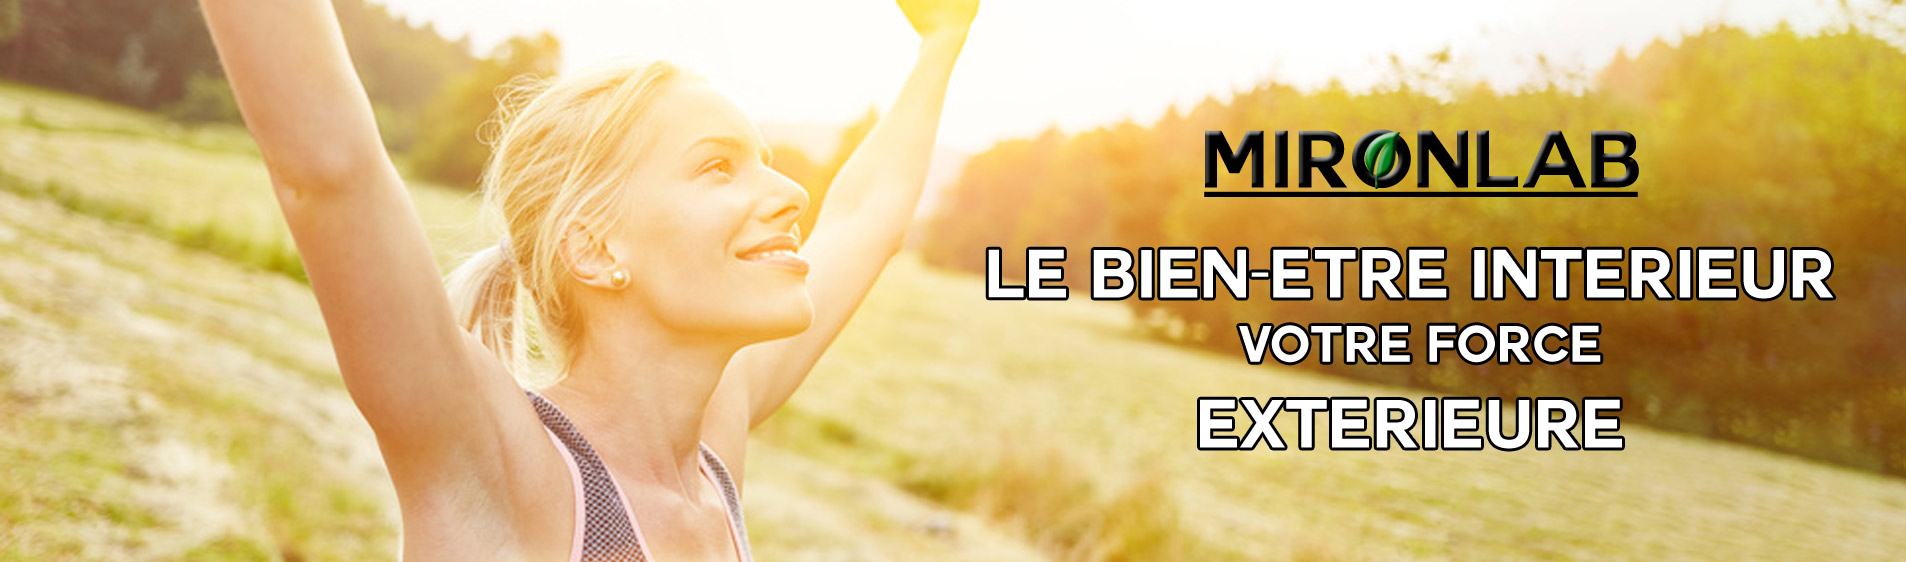 bien-etre-Mironlab-slide